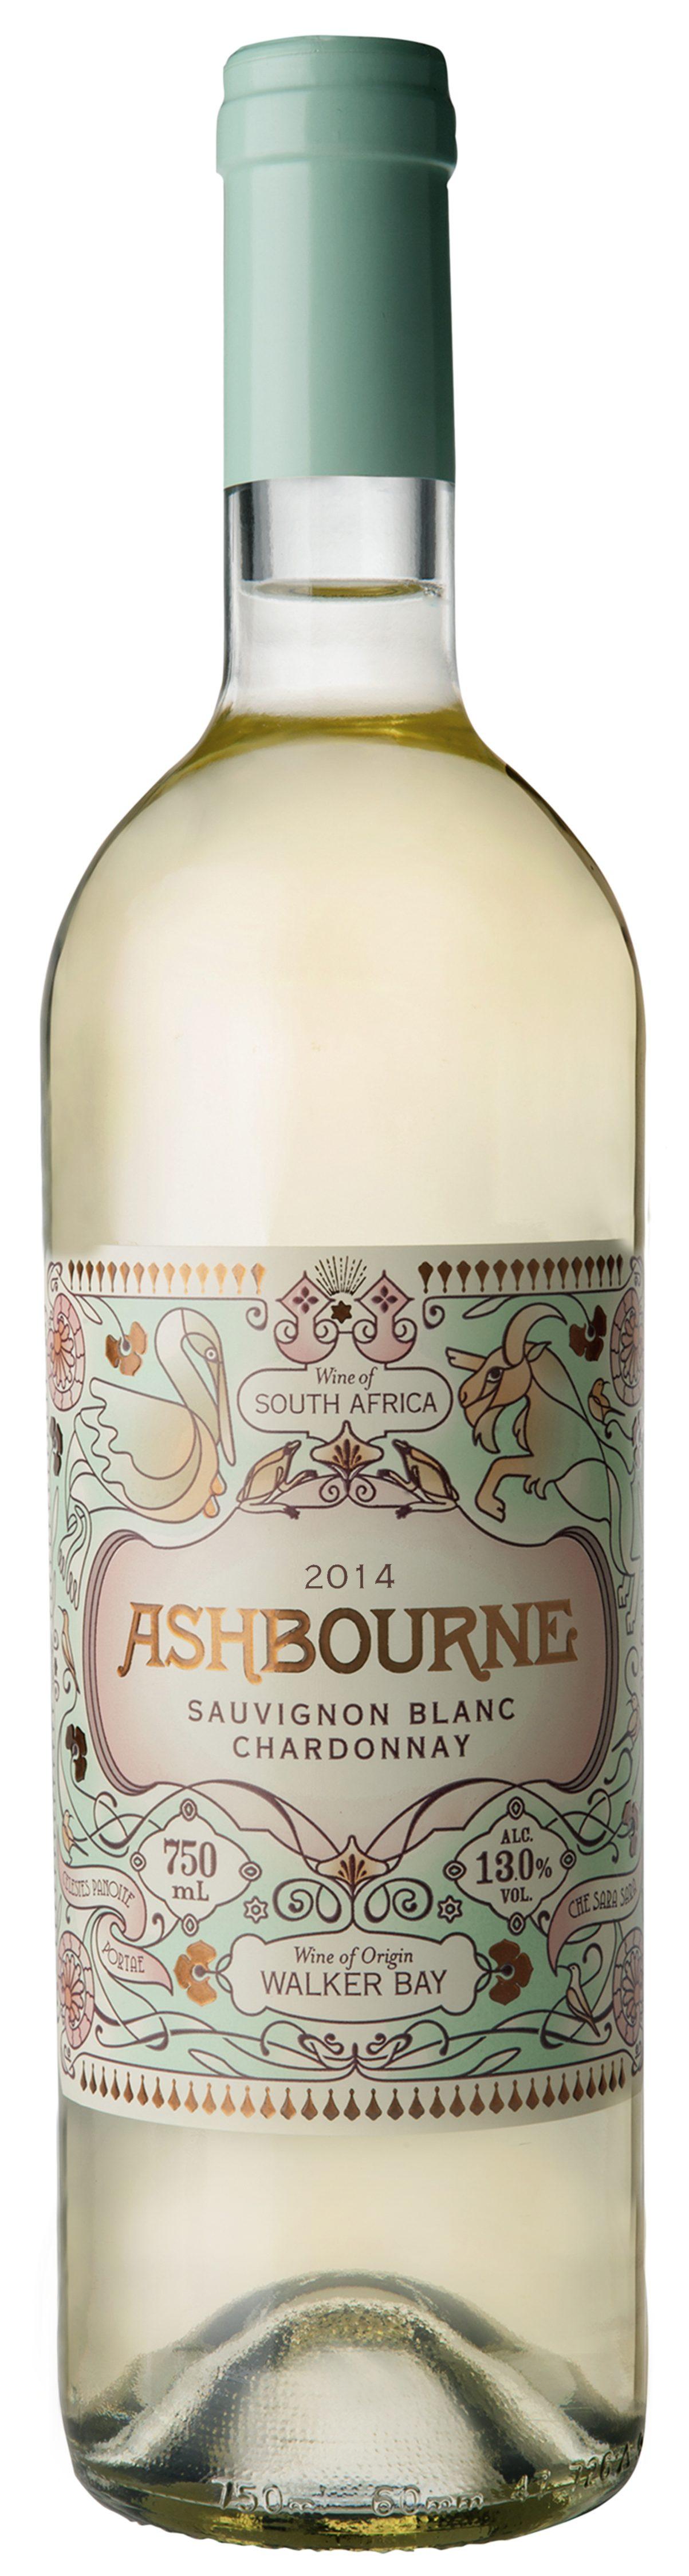 Hamilton Russell Ashbourne Sauvignon Blanc / Chardonnay